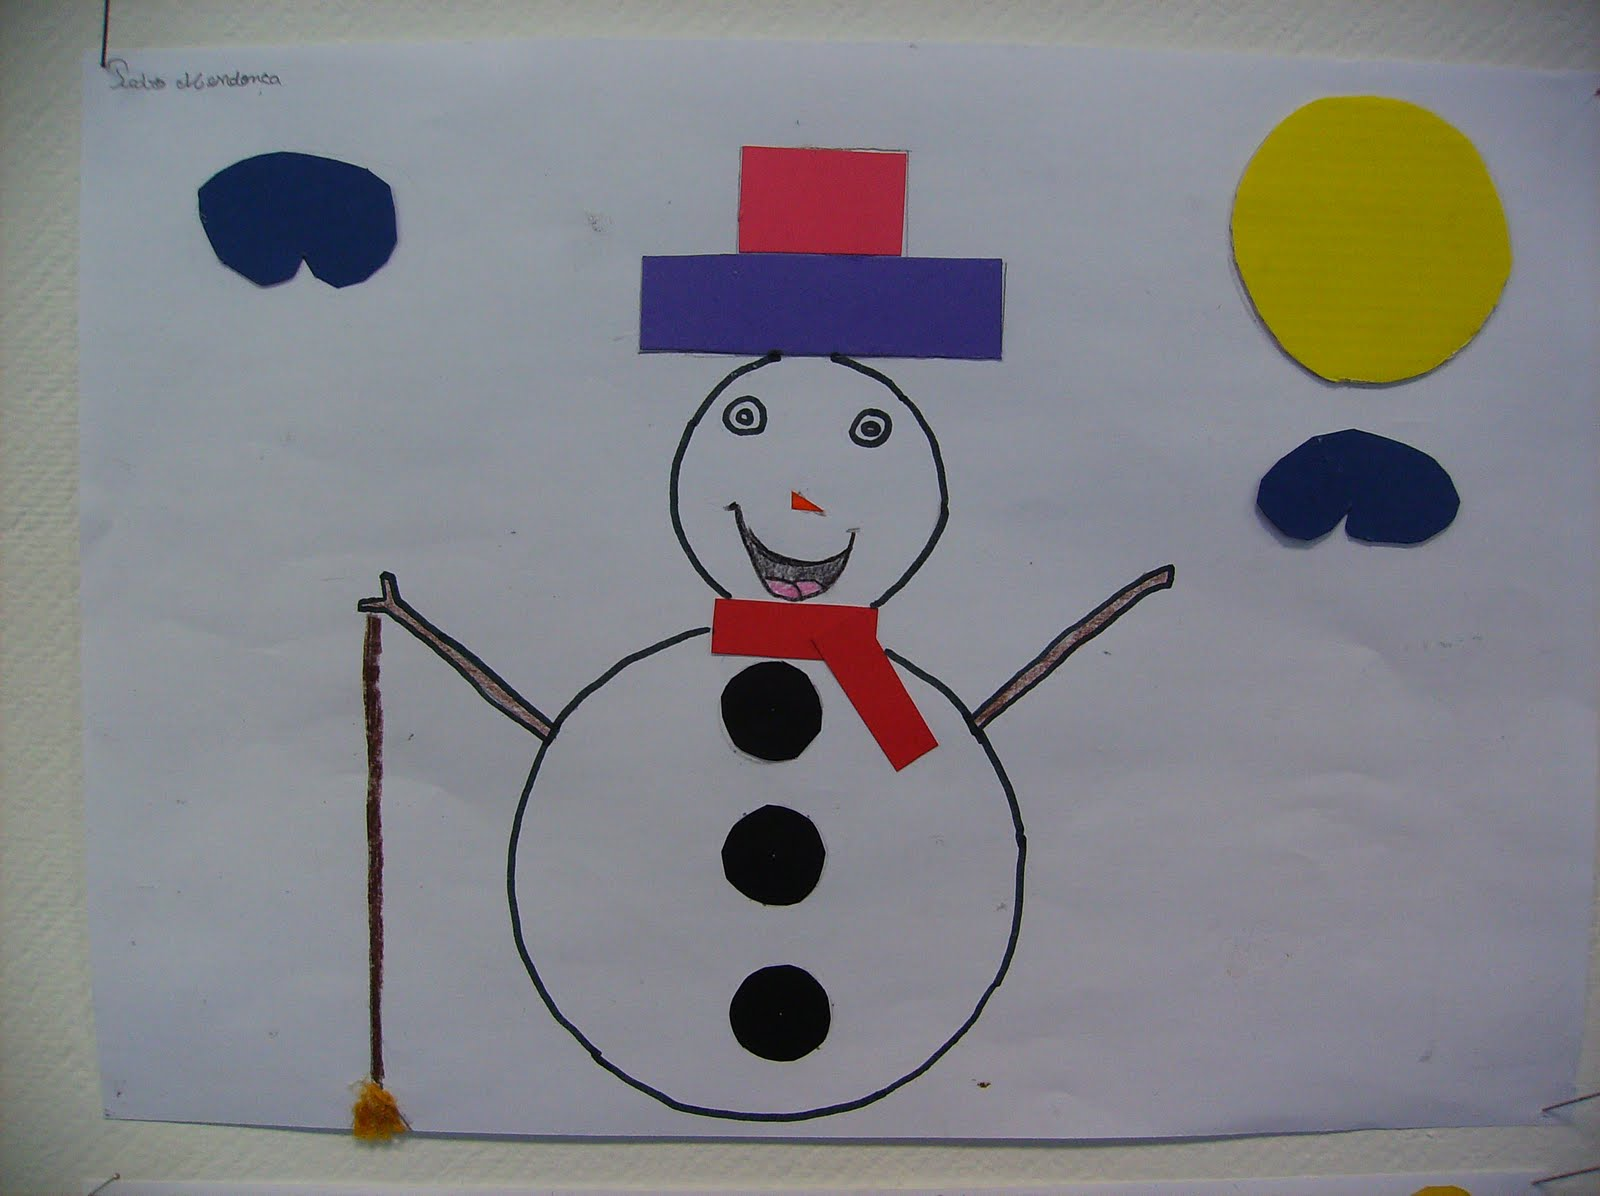 Aprendemos como esquíos de inverno